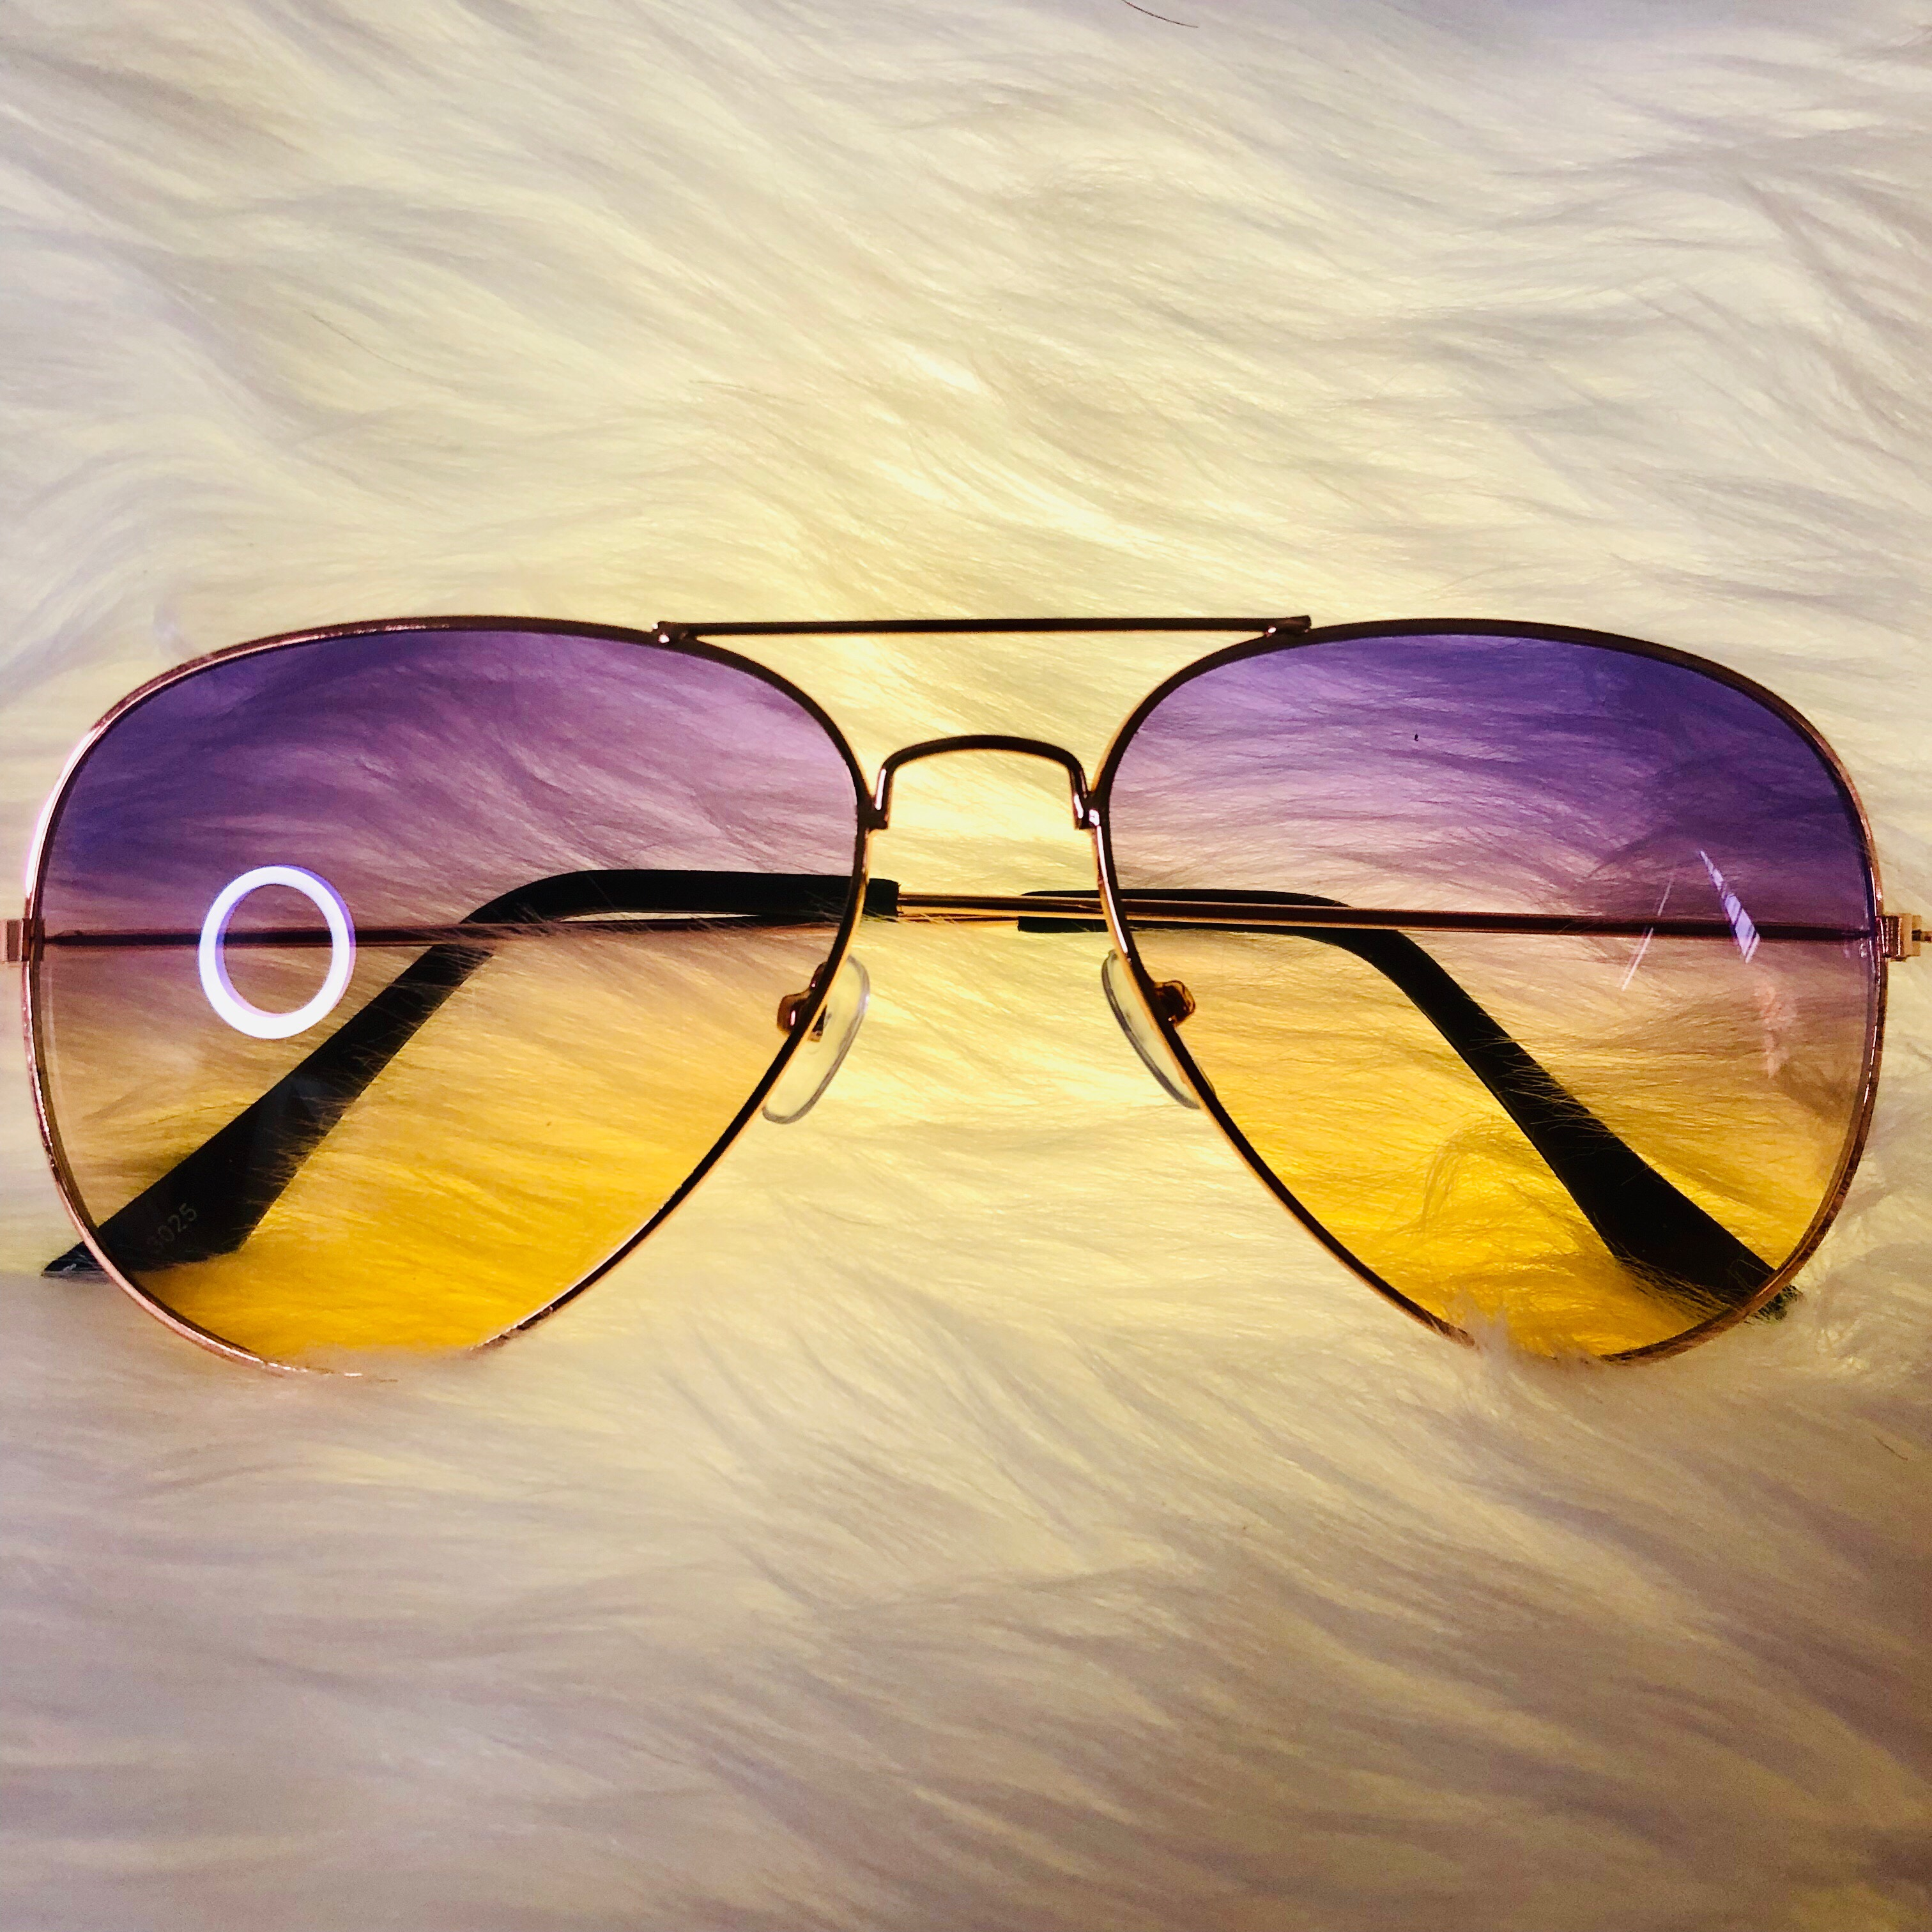 Malibu Sunnies Fashion Sunglasses Summer Shades Yellow And Violet Rainbow Color Shades Men Women W Uv Ray Protection W Free Pouch Lazada Ph